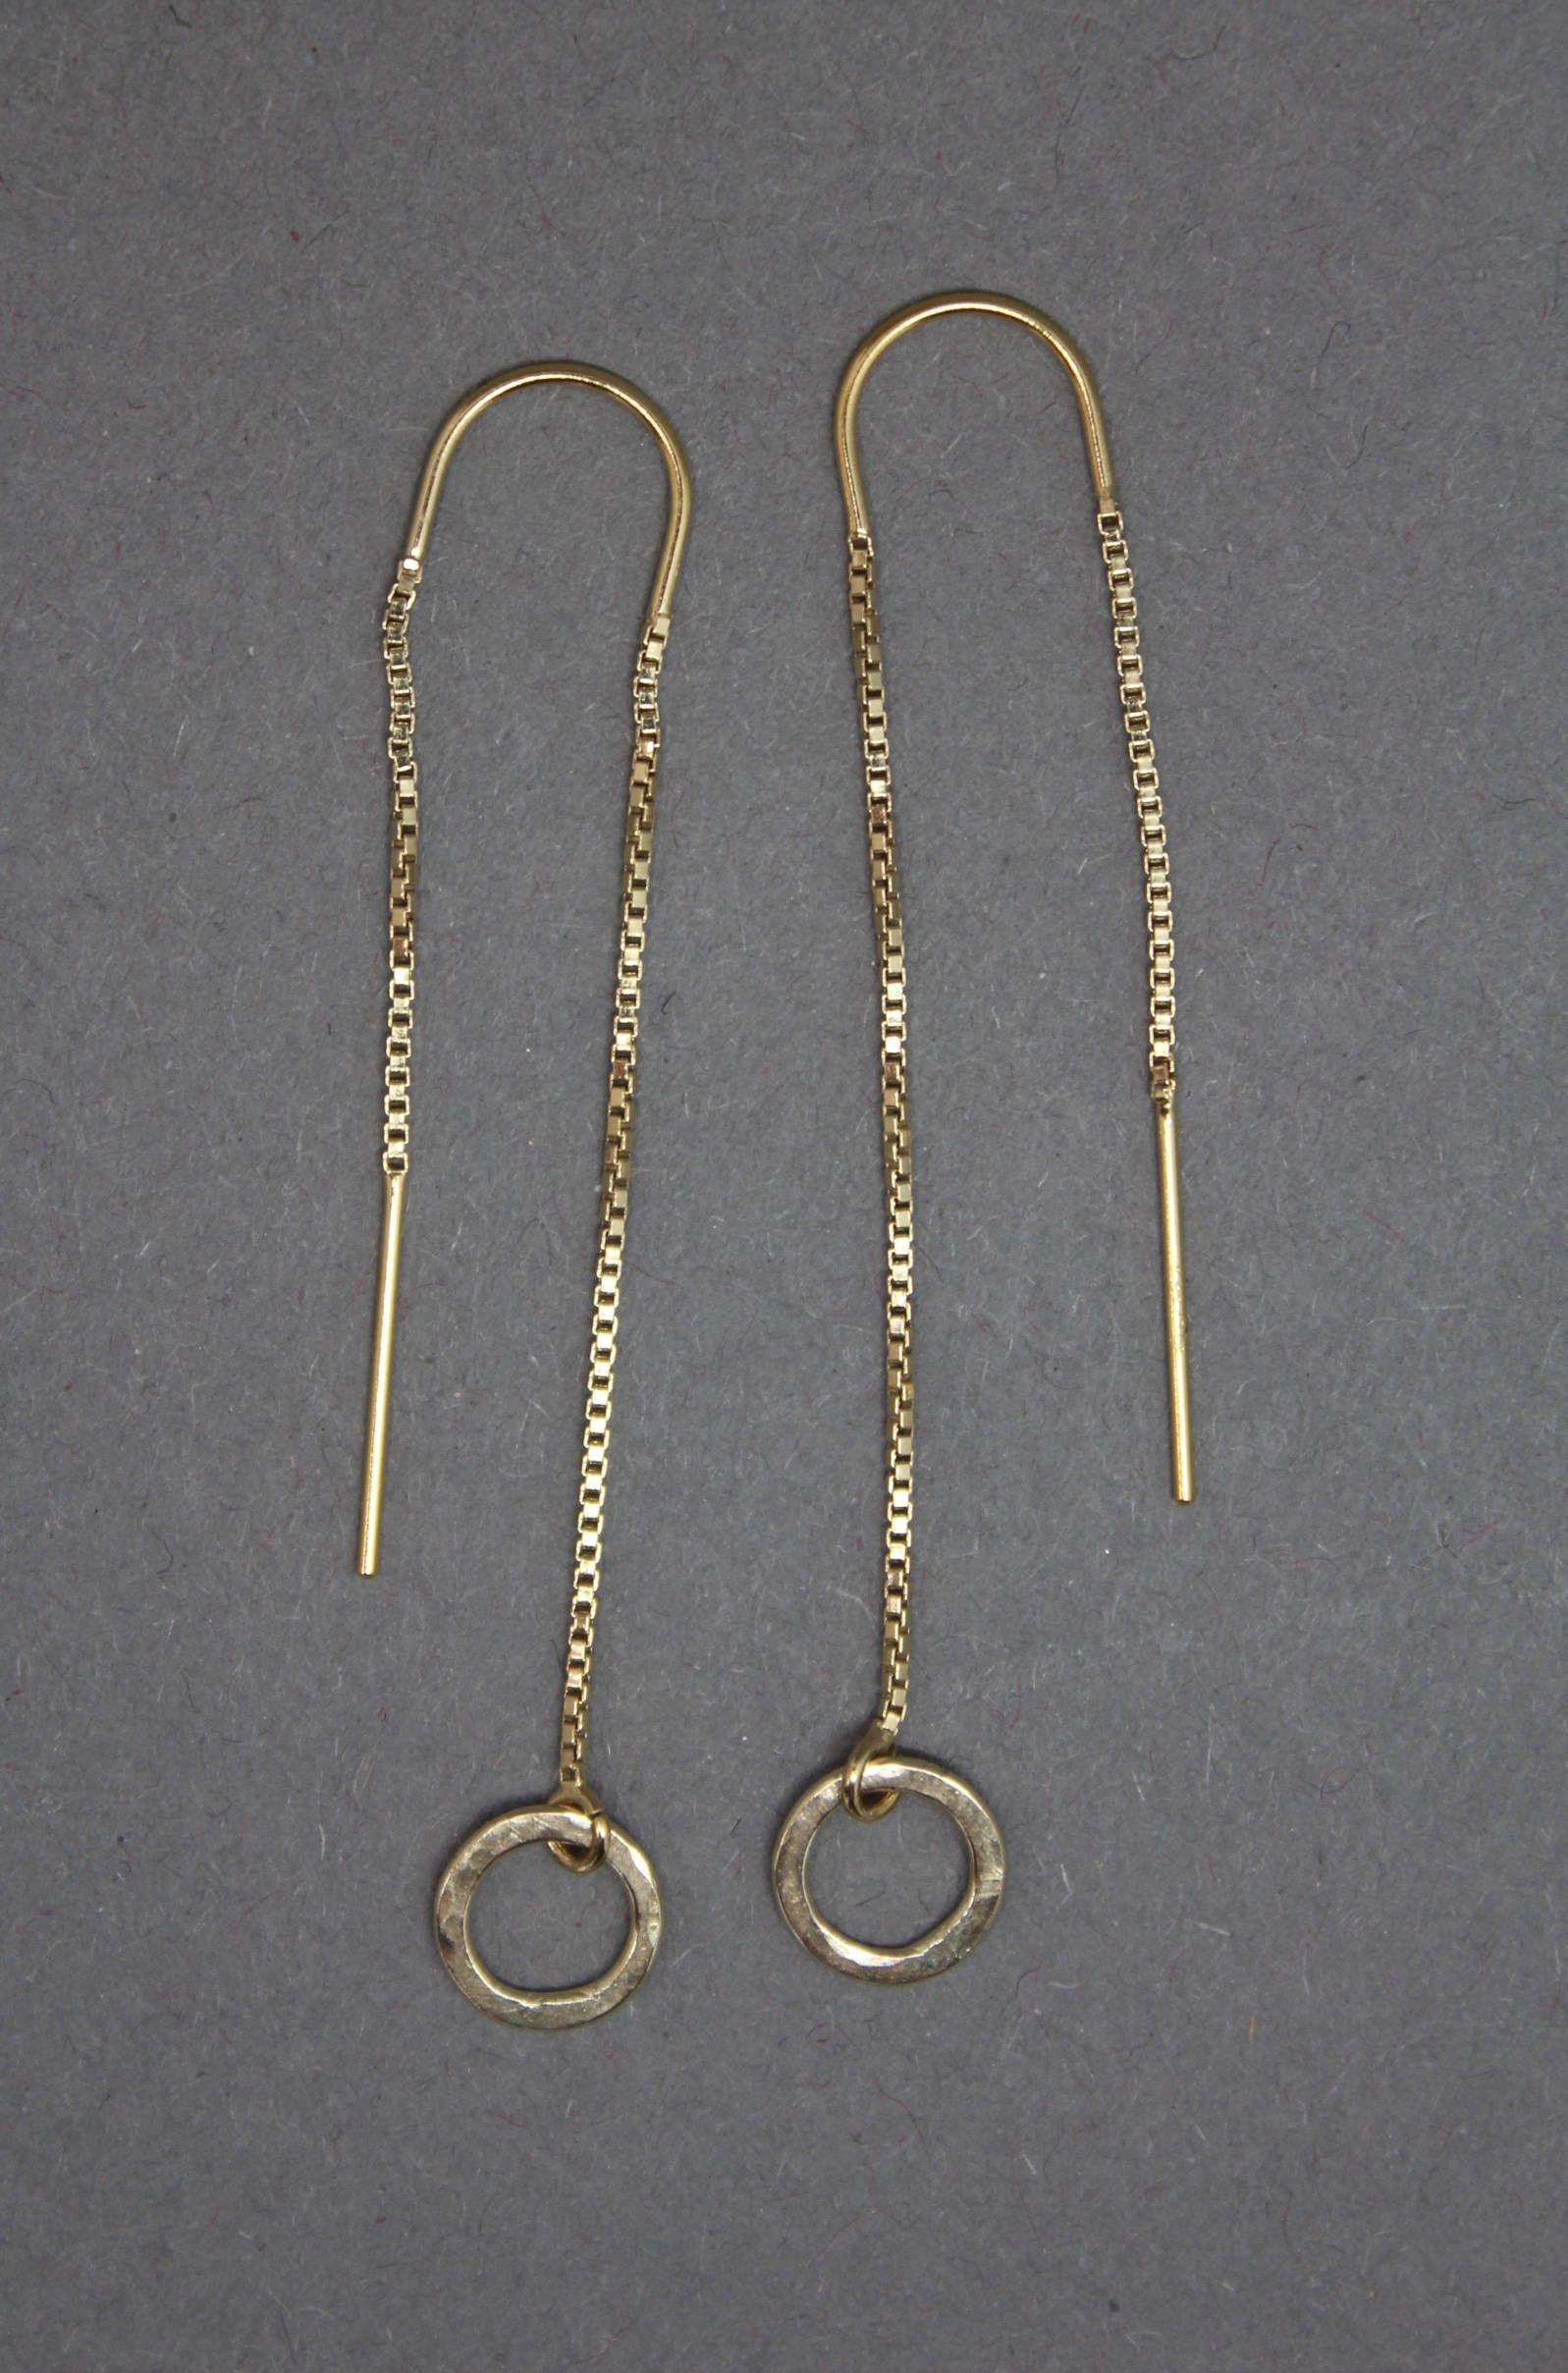 14k Gold Filled Threader Earrings Long Thread Ear Threaders Hoop By Ahjewellery1